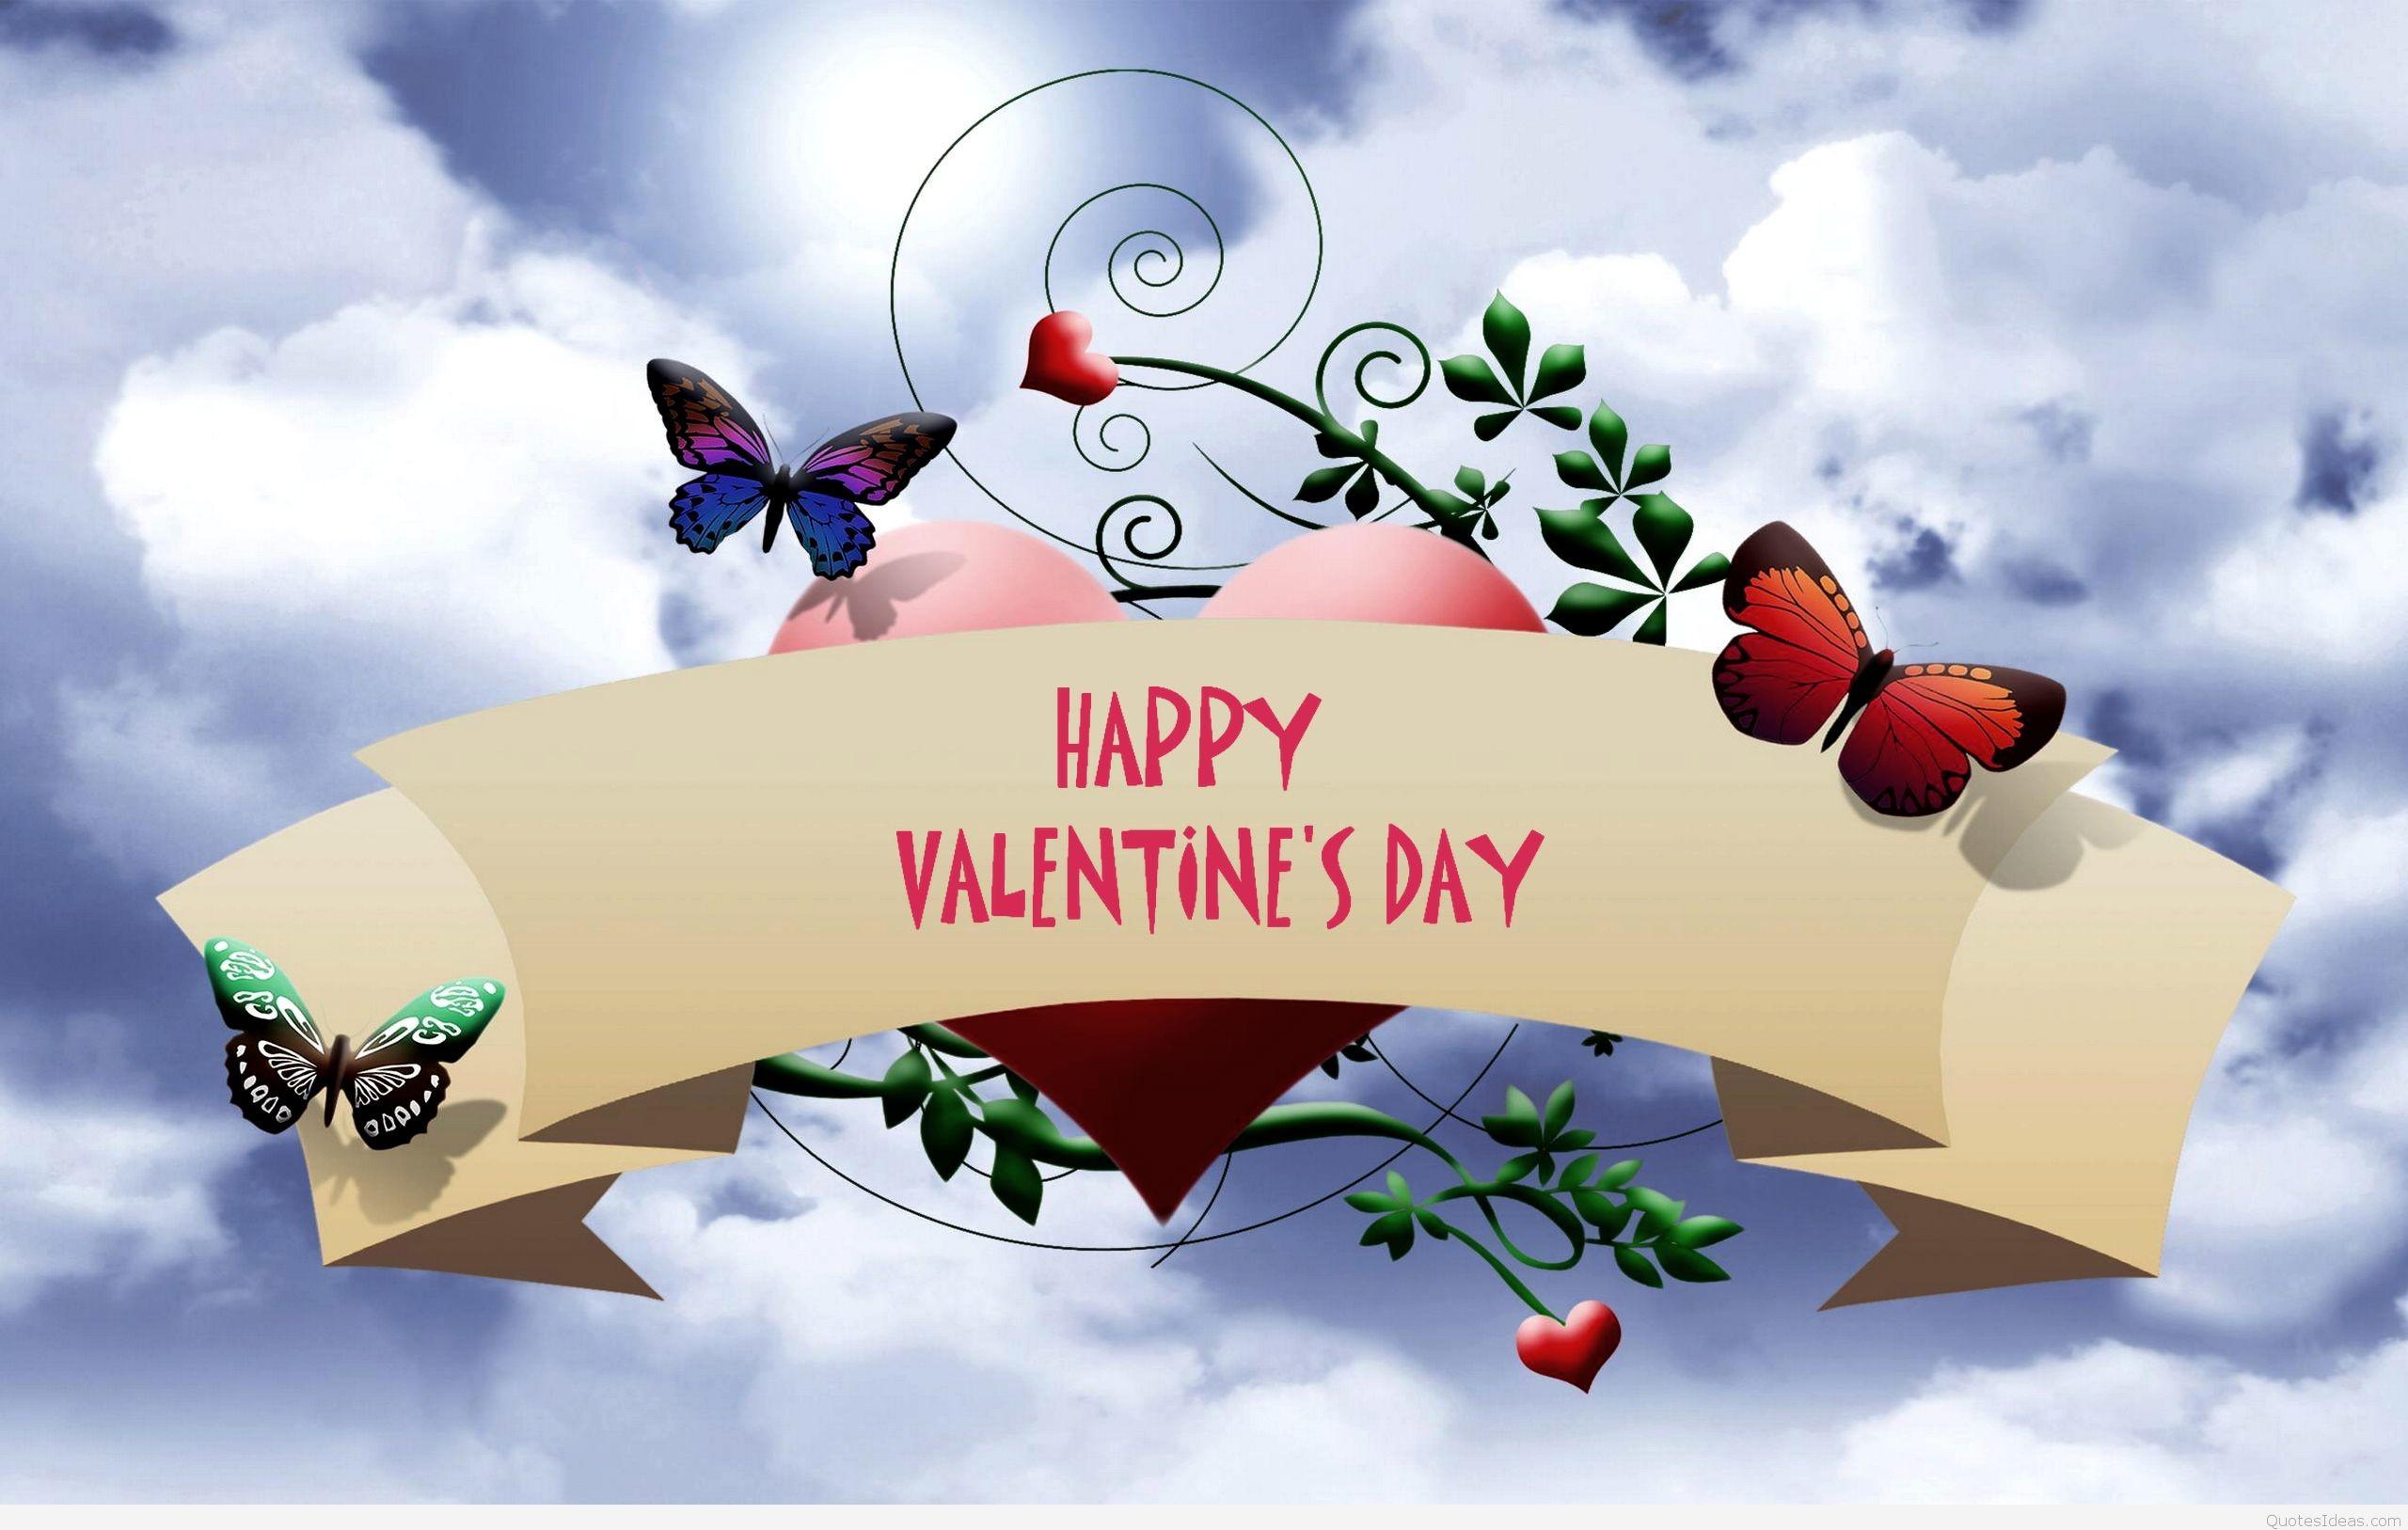 Happy Valentine's Day Wallpaper